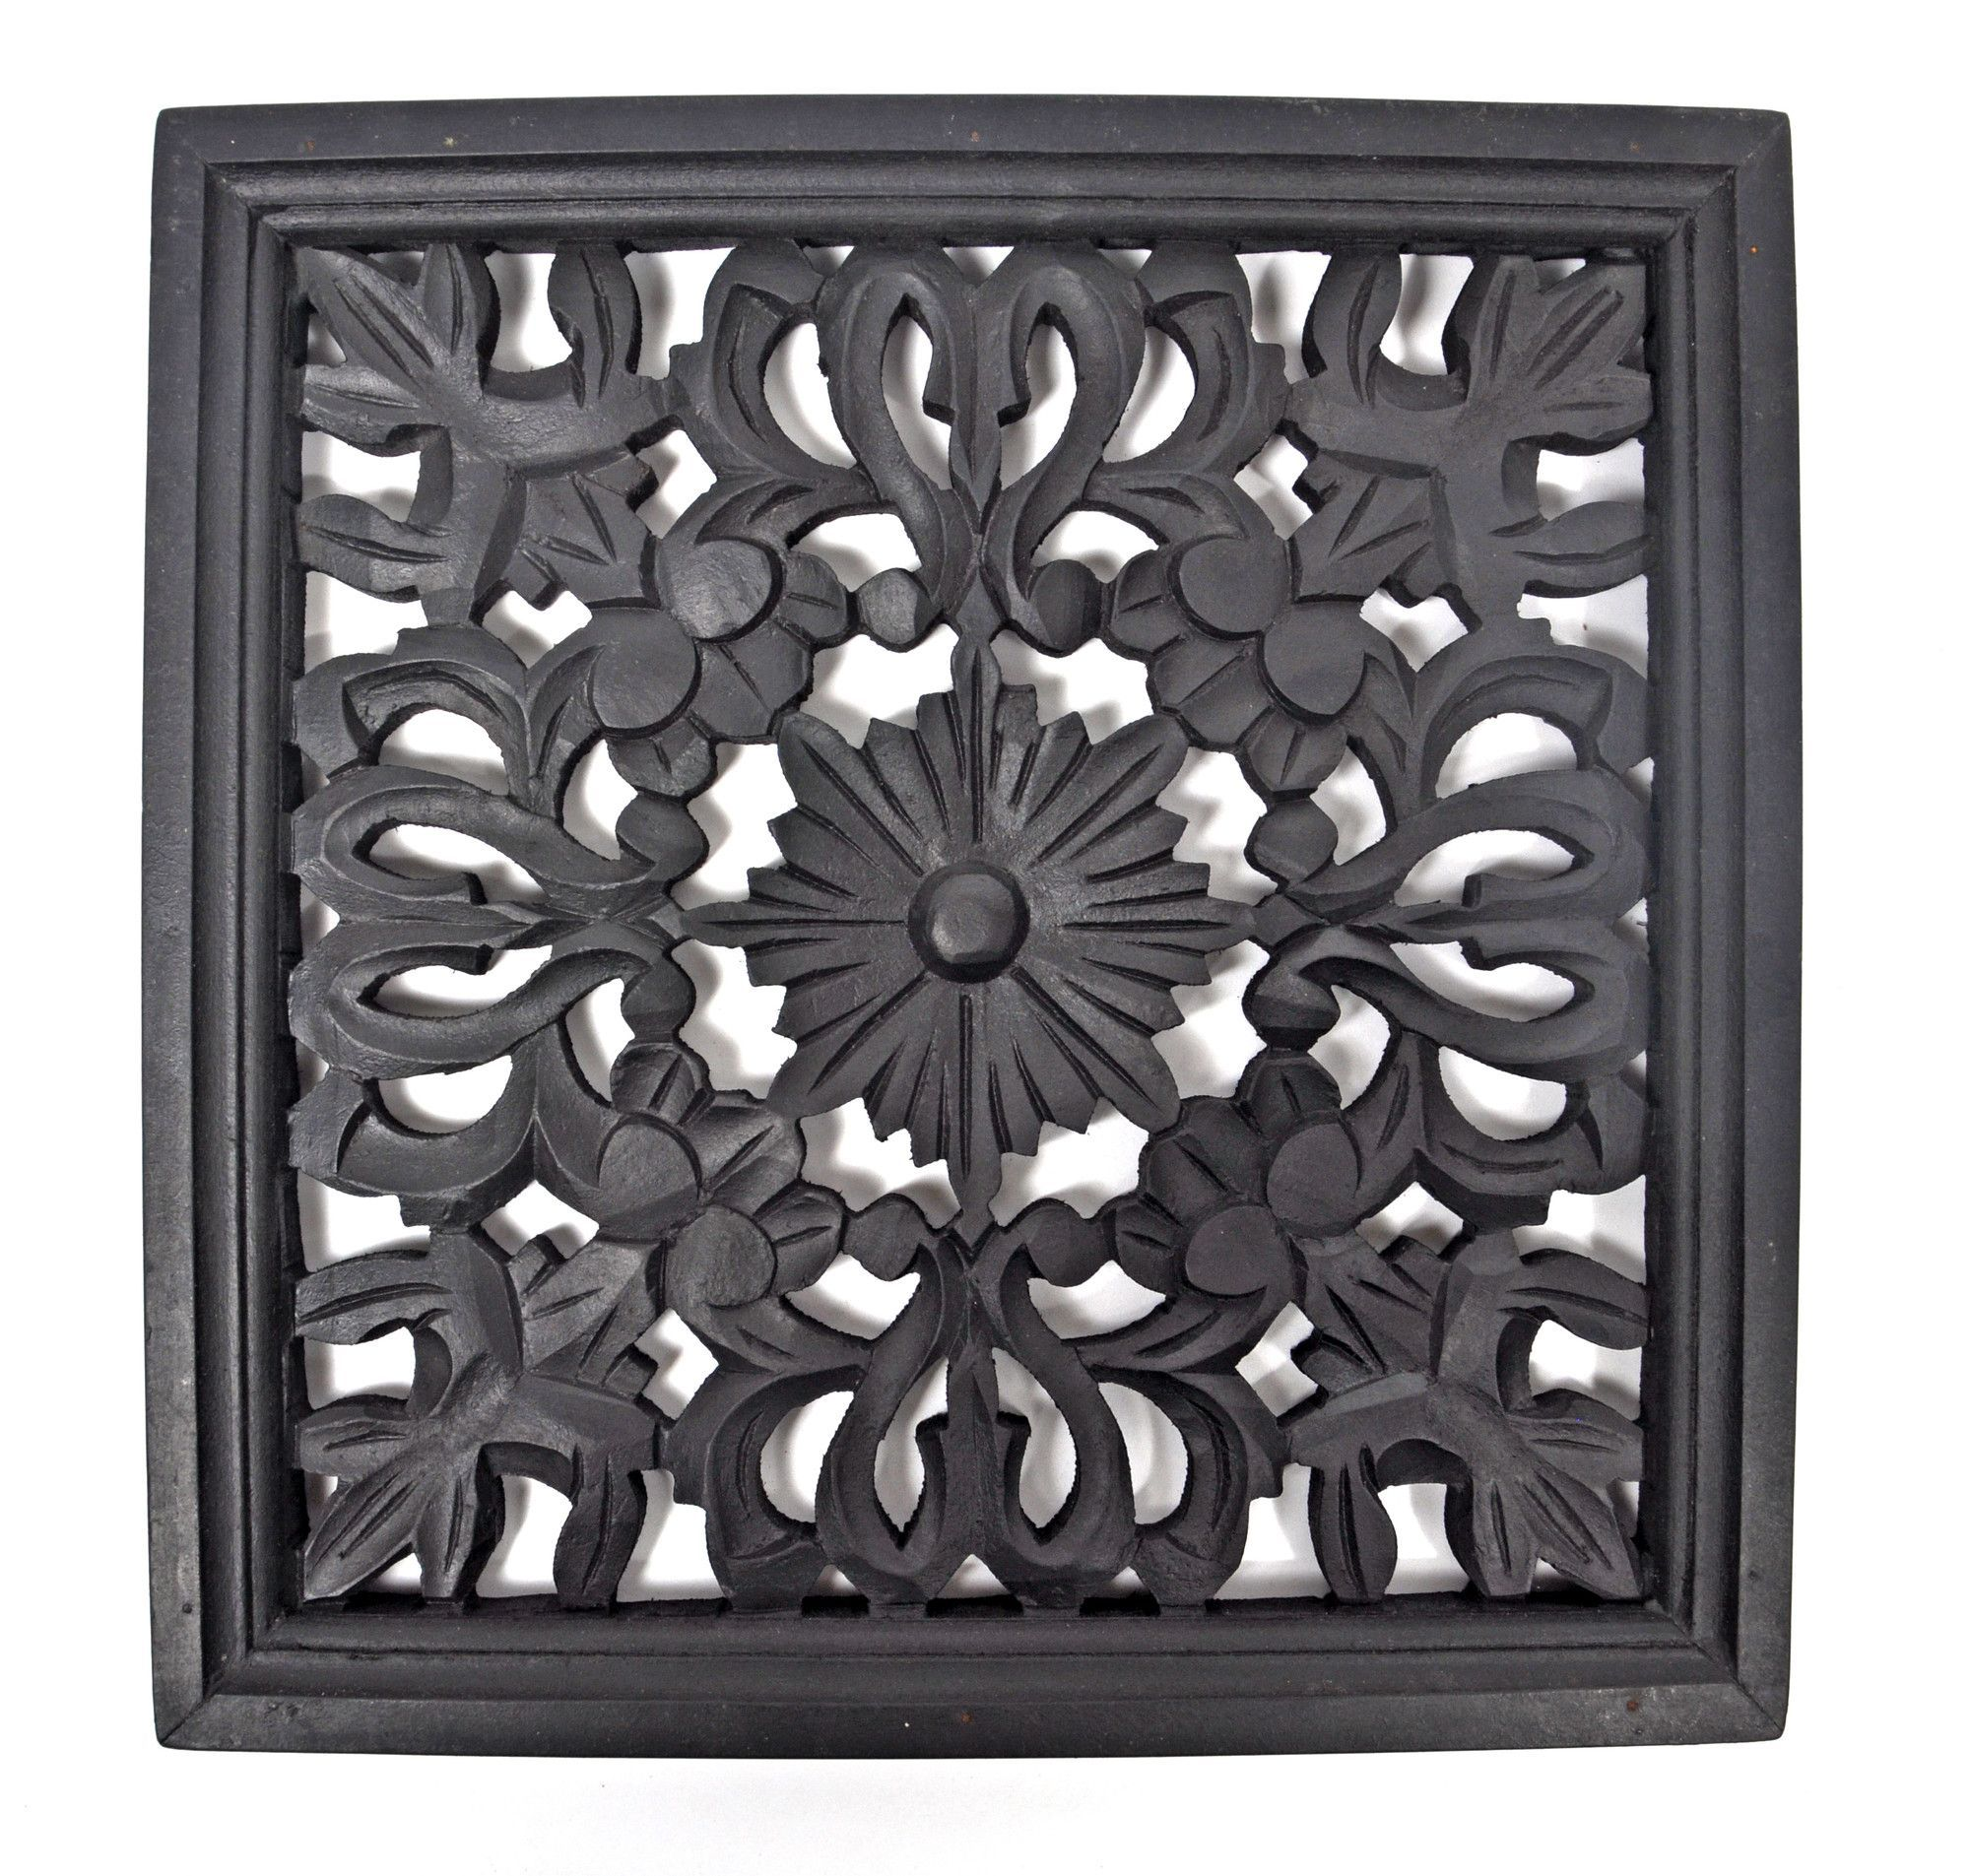 Idella Indian Wooden Panel Wall Decor | Wall paneling ...